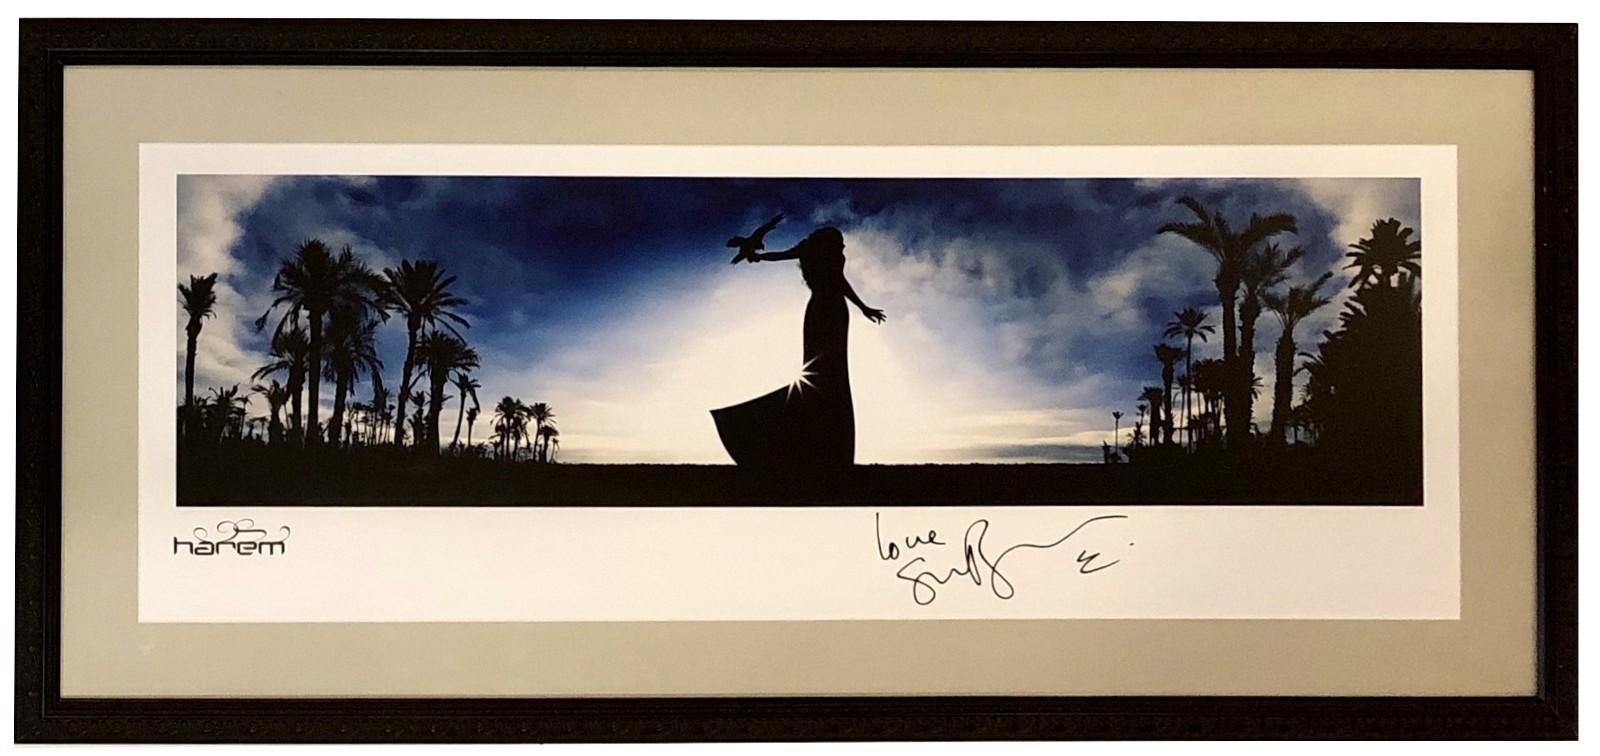 SARAH BRIGHTMAN AUTOGRAPHED Hand SIGNED HAREM WORLD TOUR POSTER FRAMED w/COA  - $399.99